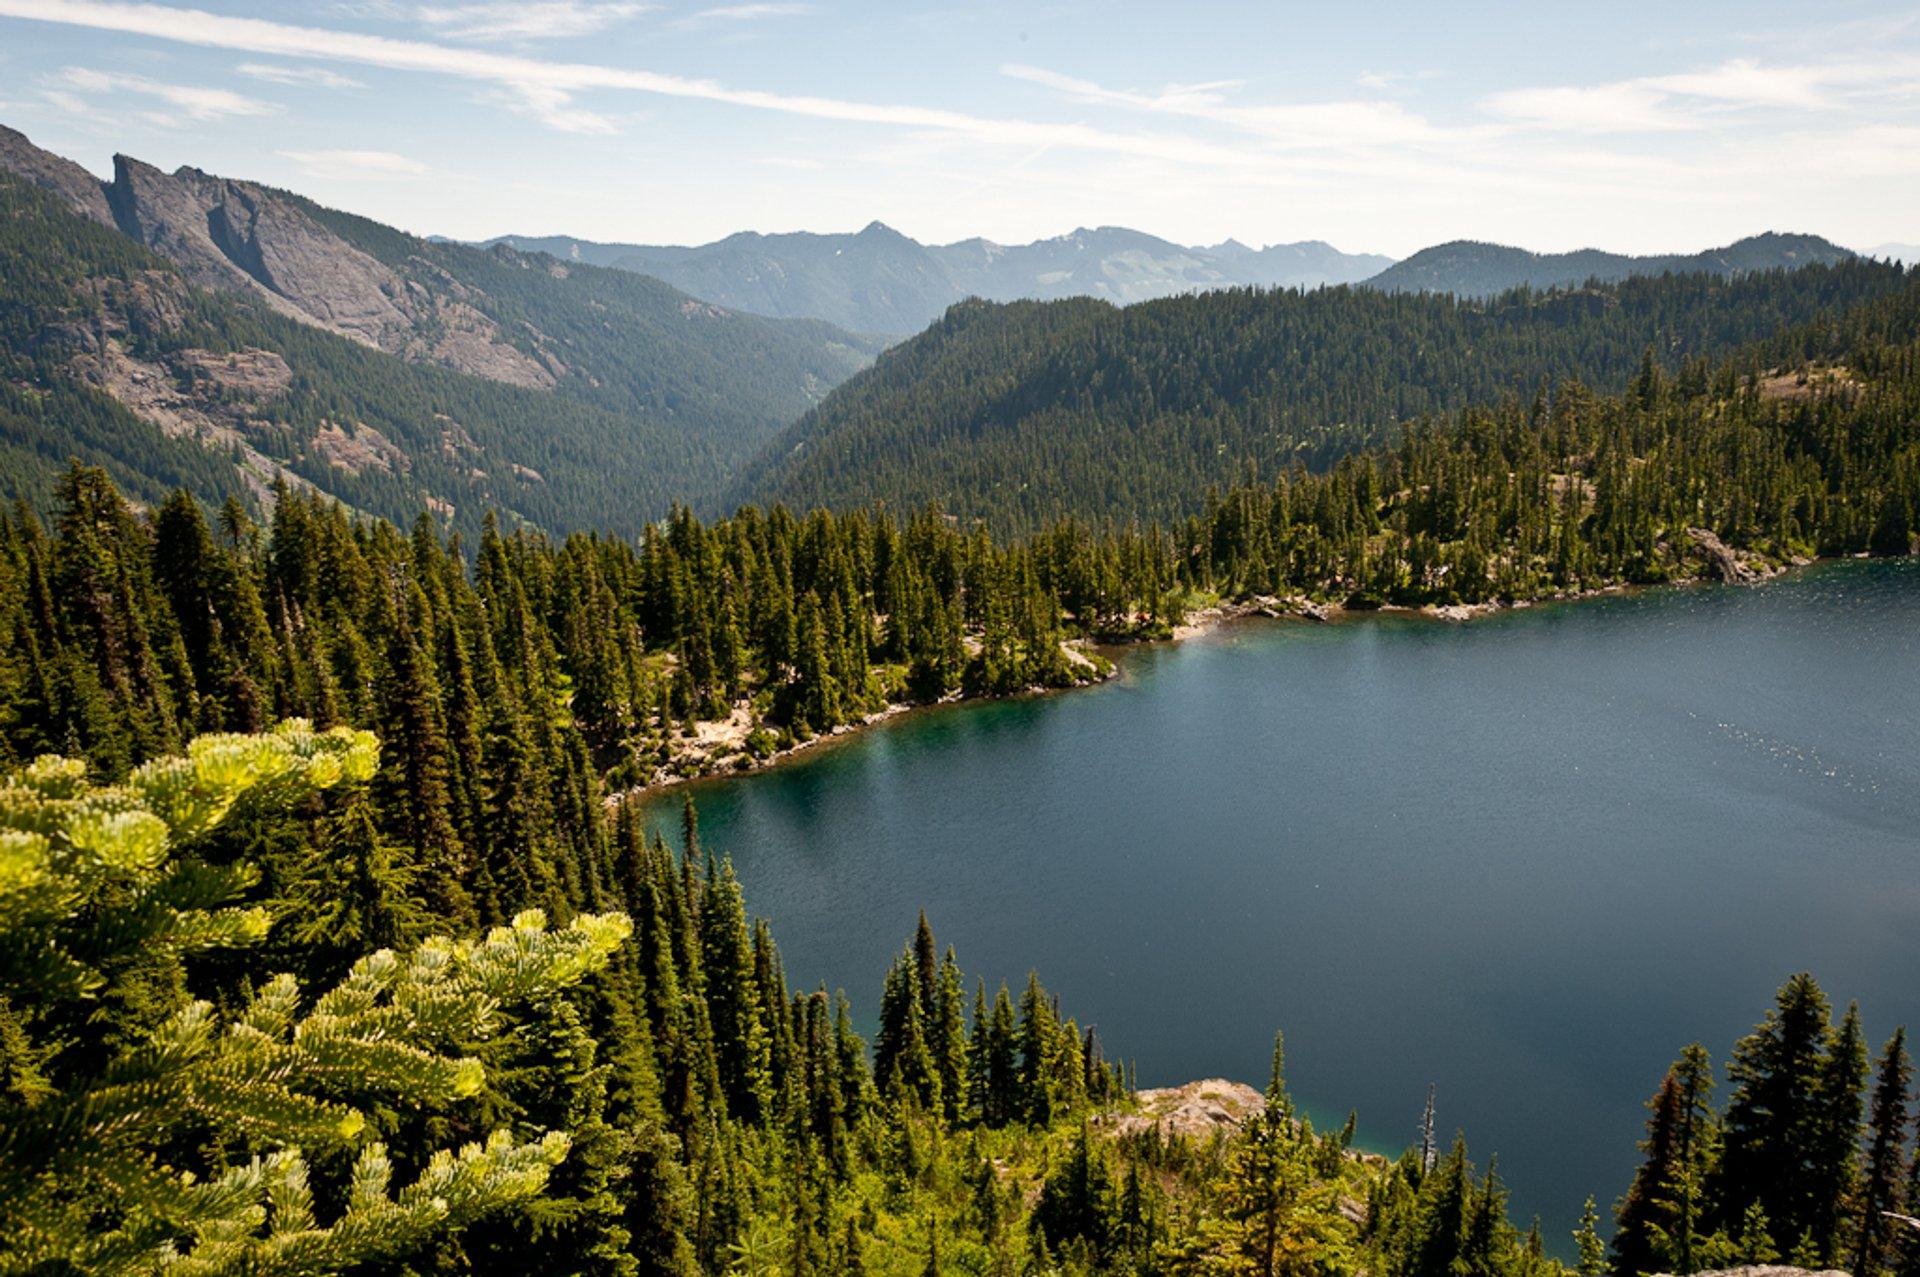 Rachel Lake in Washington 2020 - Best Time